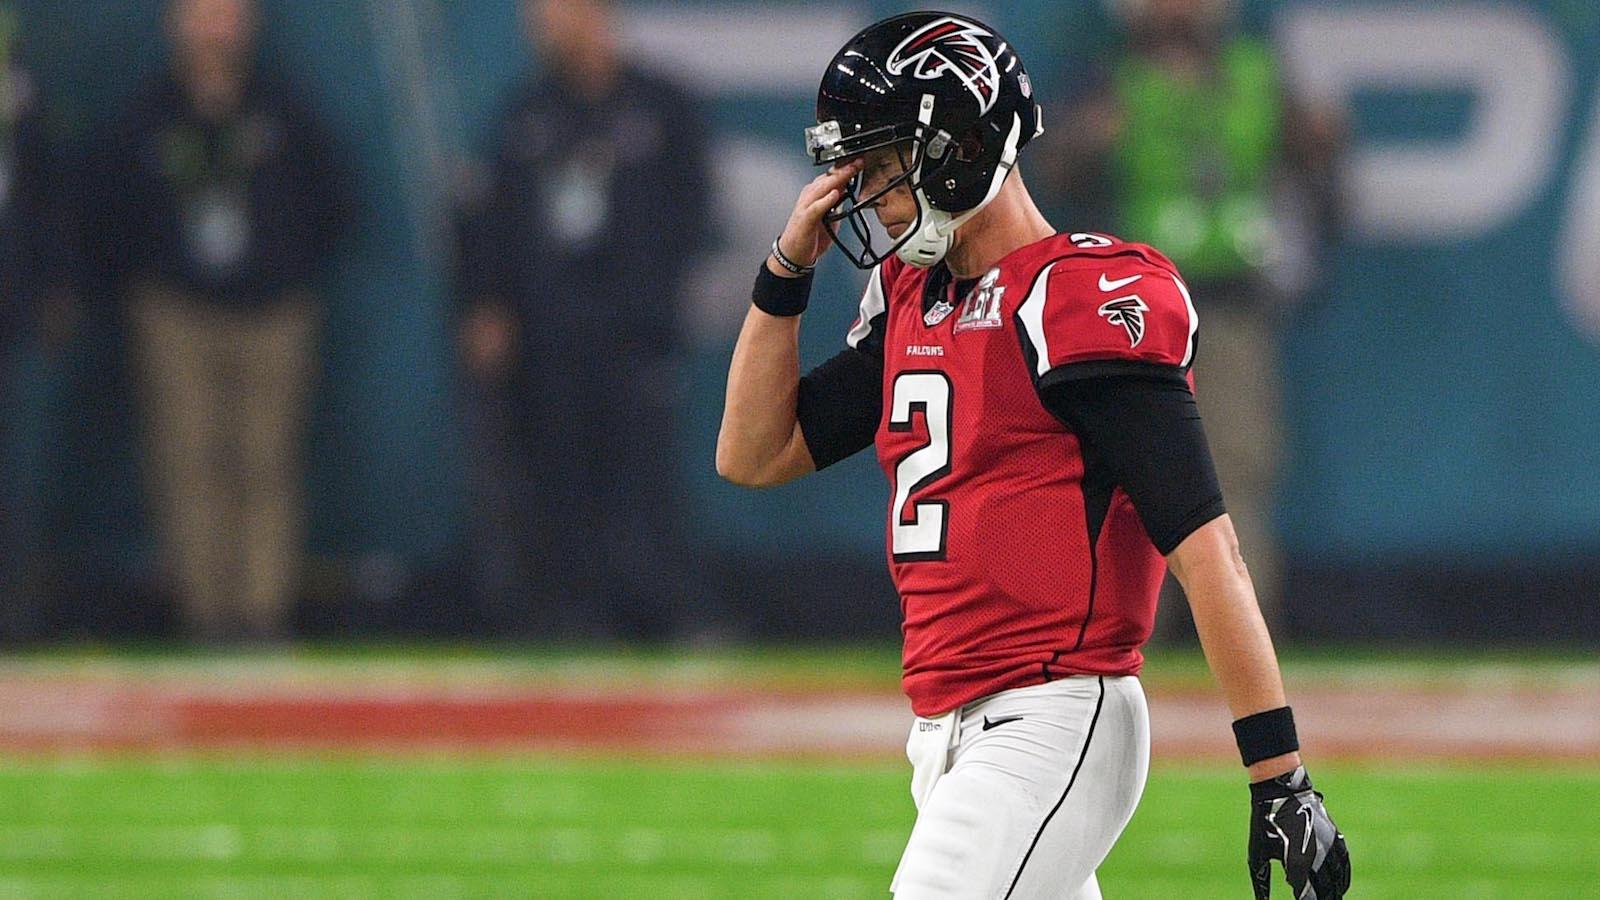 Feb 5, 2017; Houston, TX, USA; Atlanta Falcons quarterback Matt Ryan (2) reacts during the third quarter against the New England Patriots during Super Bowl LI at NRG Stadium. Mandatory Credit: Bob Donnan-USA TODAY Sports